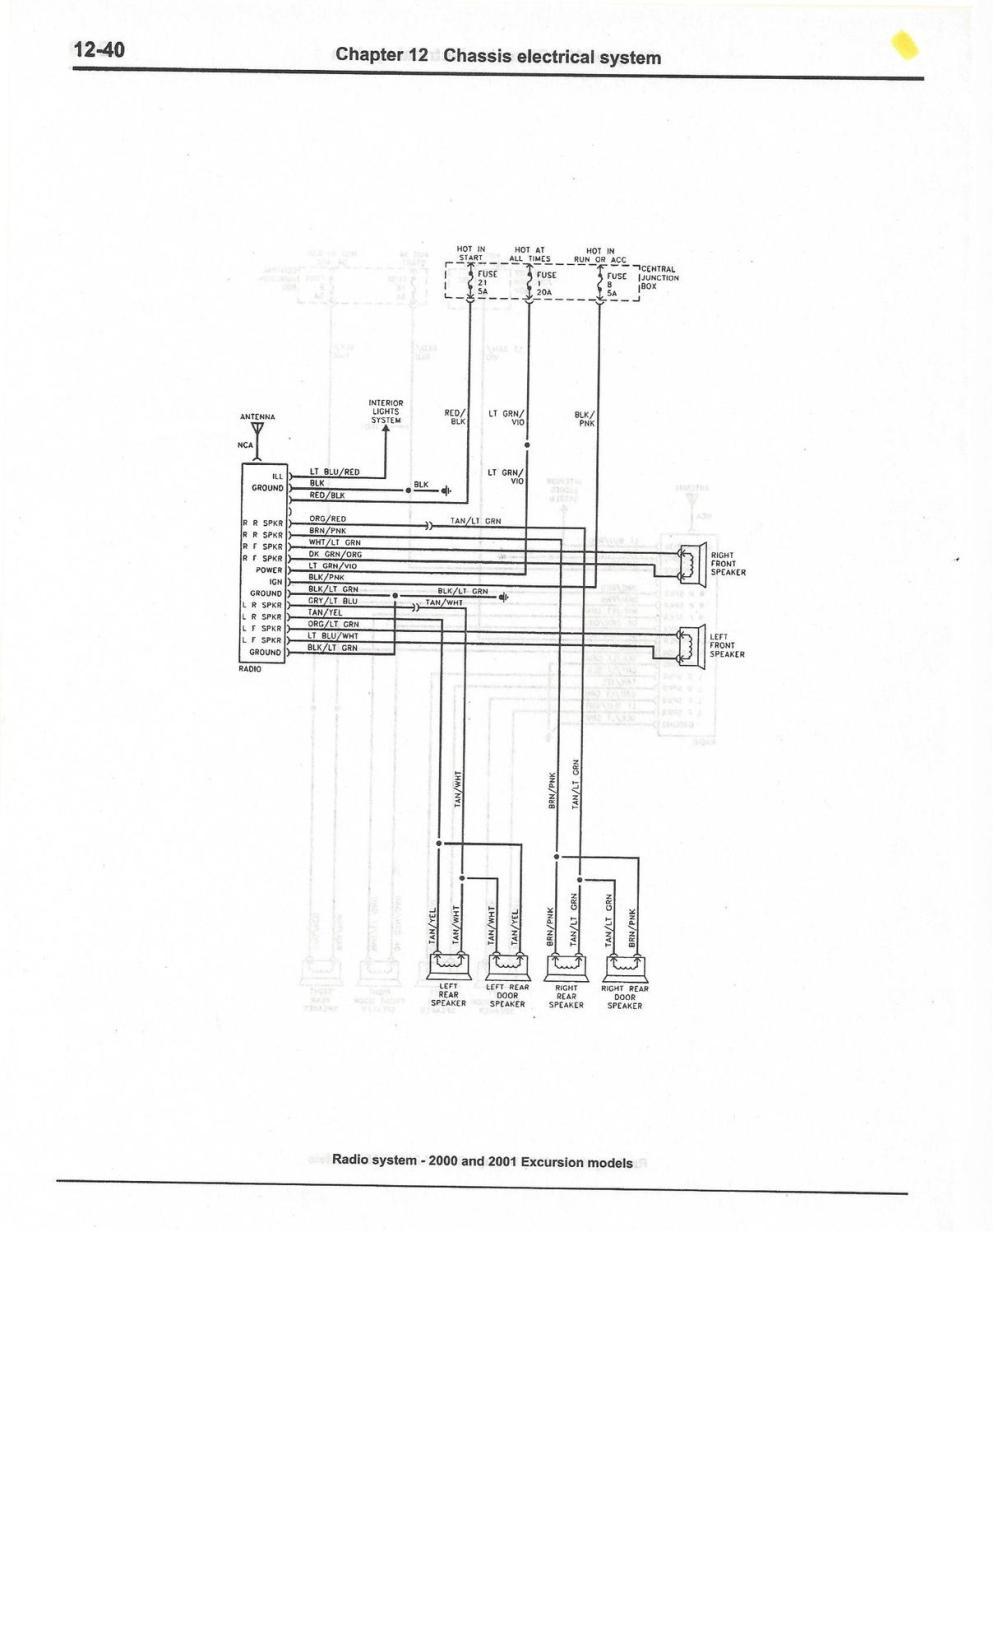 medium resolution of 01 excursion v8 engine diagram completed wiring diagram01 excursion v8 engine diagram wiring diagrams update 1985